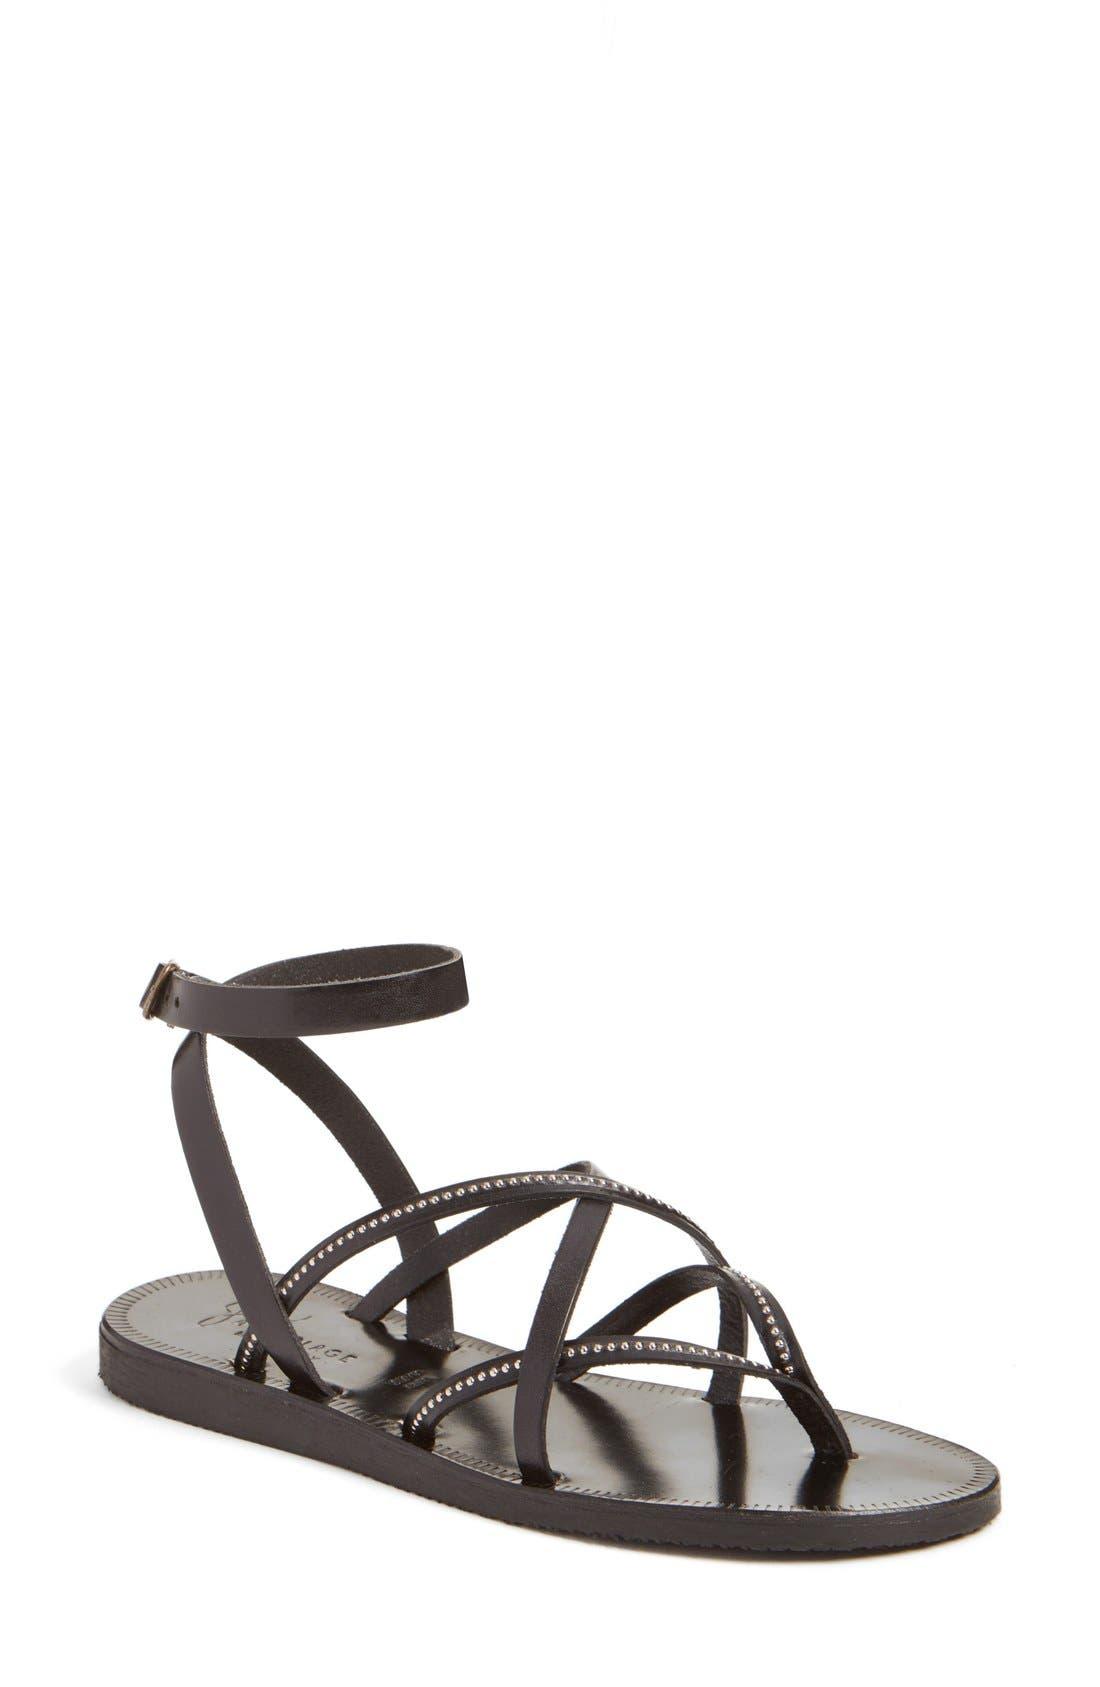 'Oda' Flat Sandal,                         Main,                         color, 003